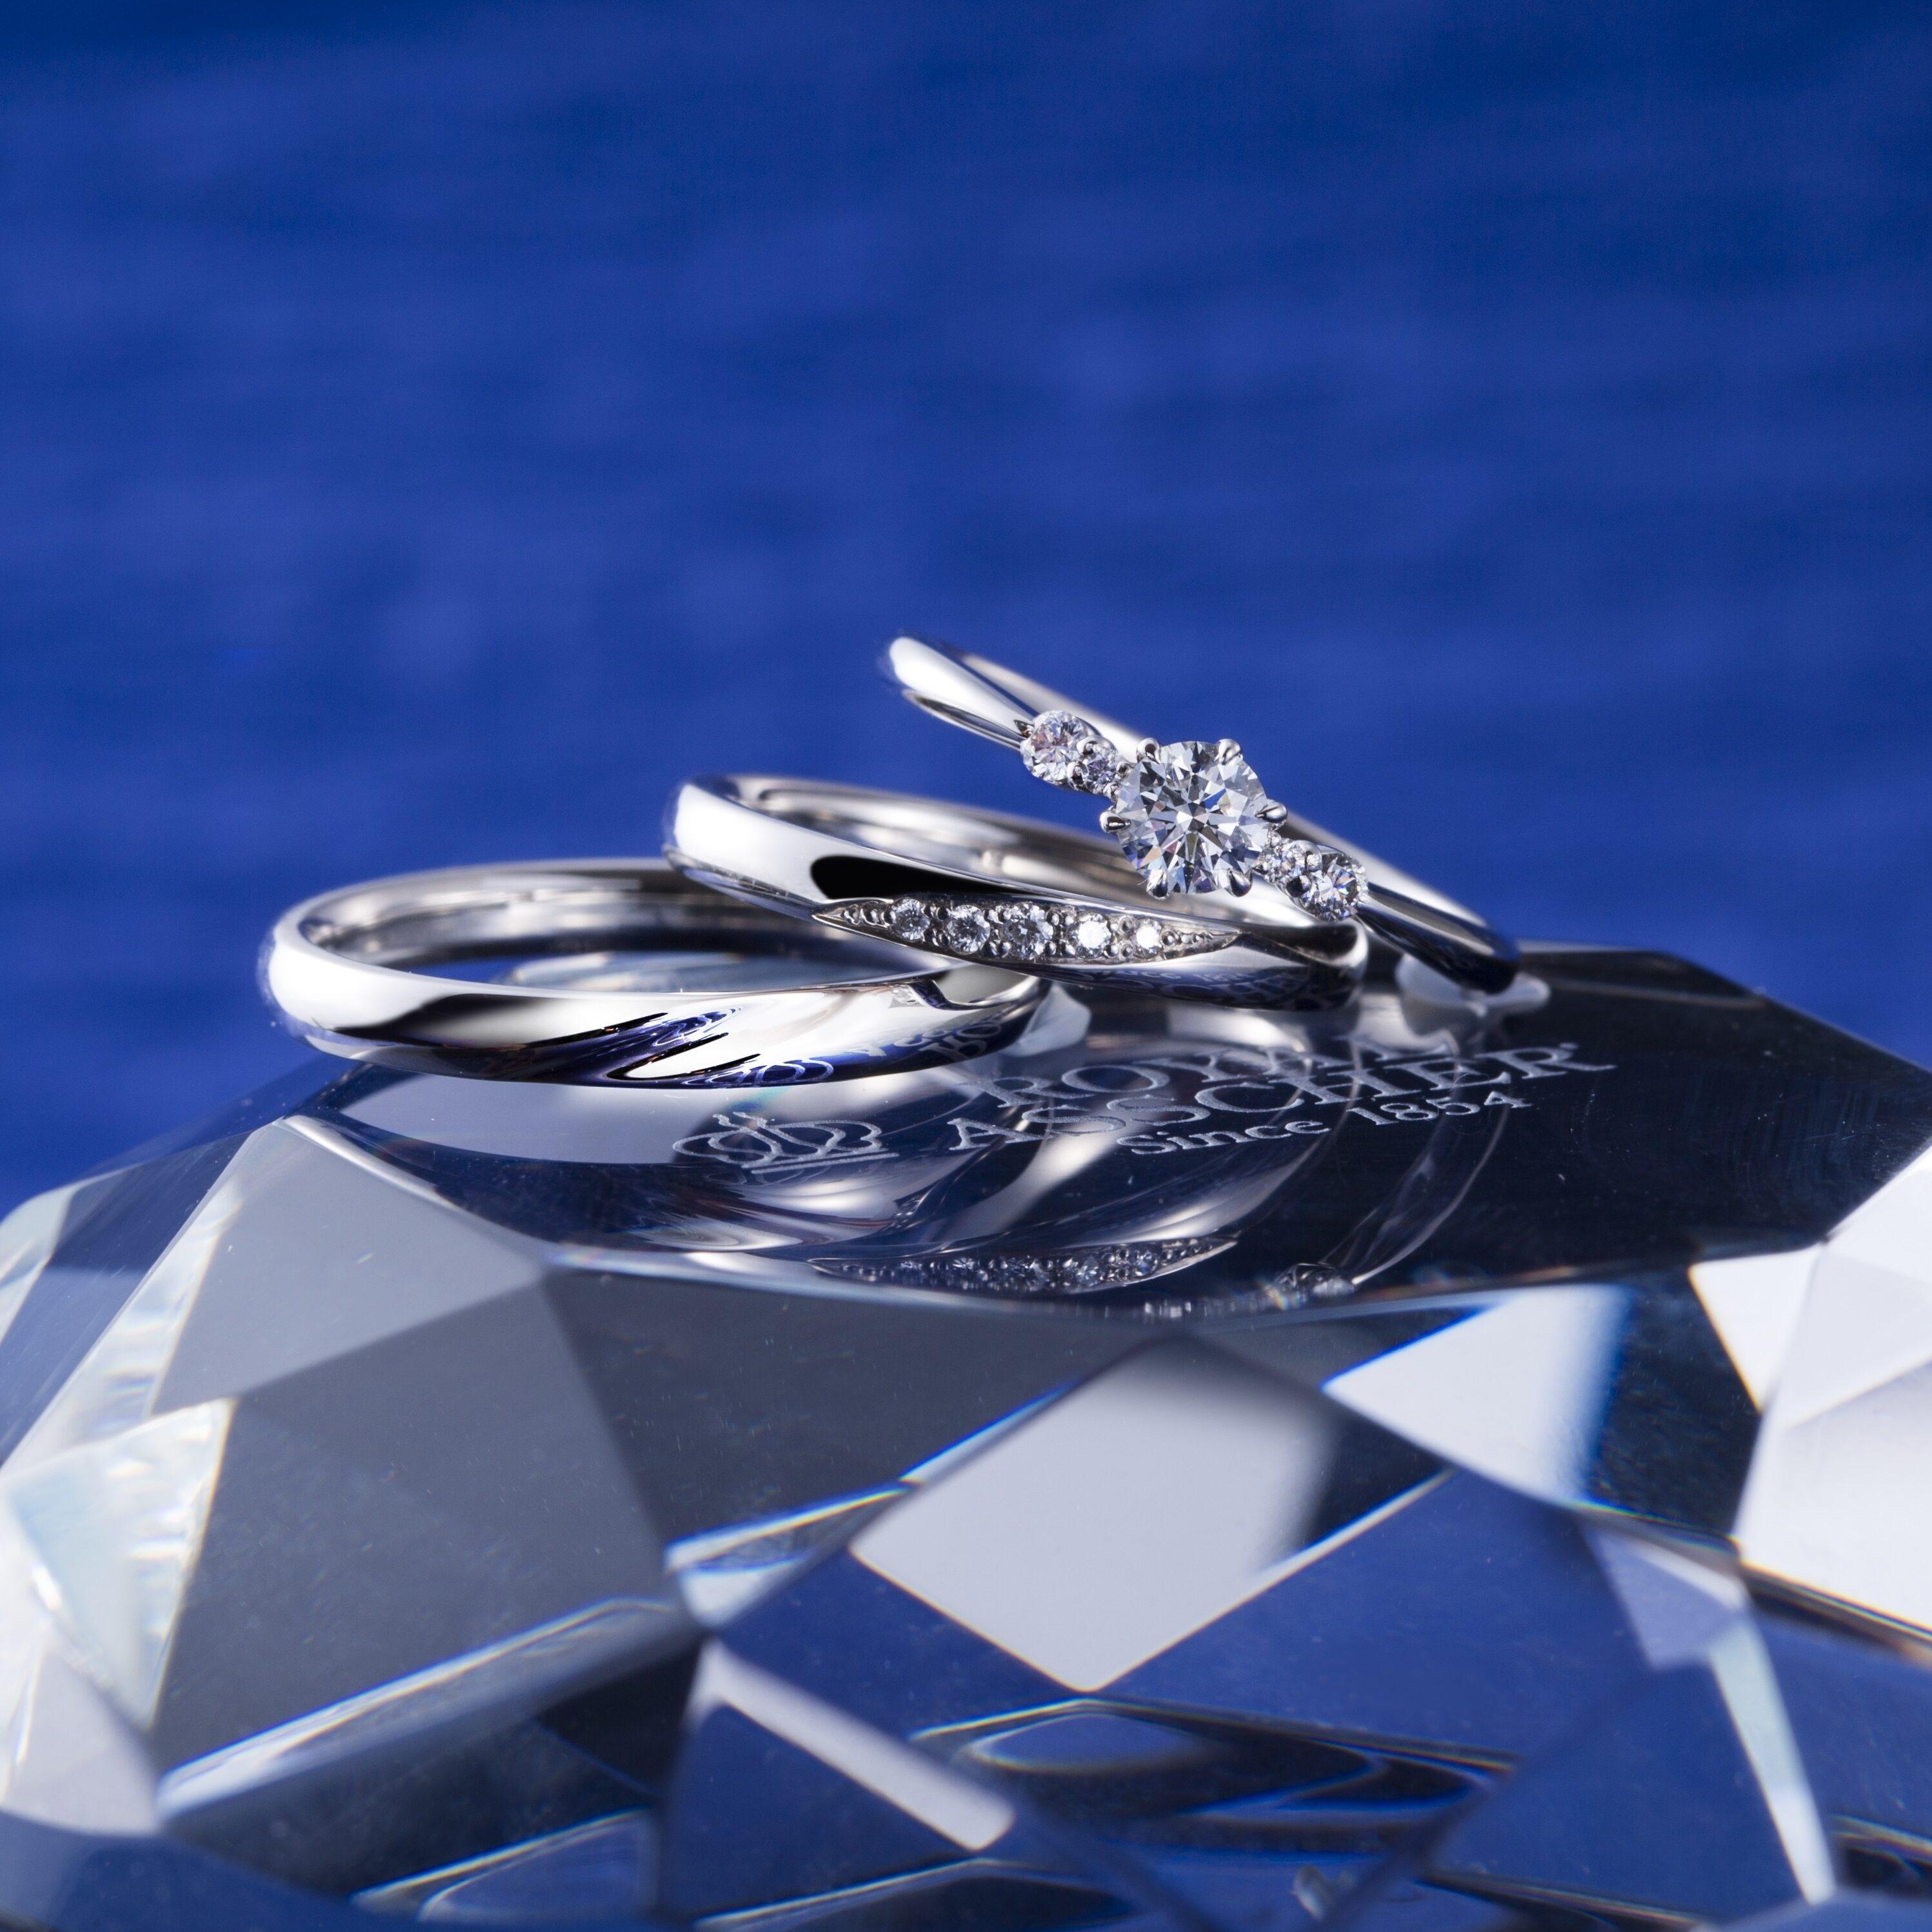 ERA814 WRA066 WRB076|ロイヤルアッシャー婚約指輪・結婚指輪